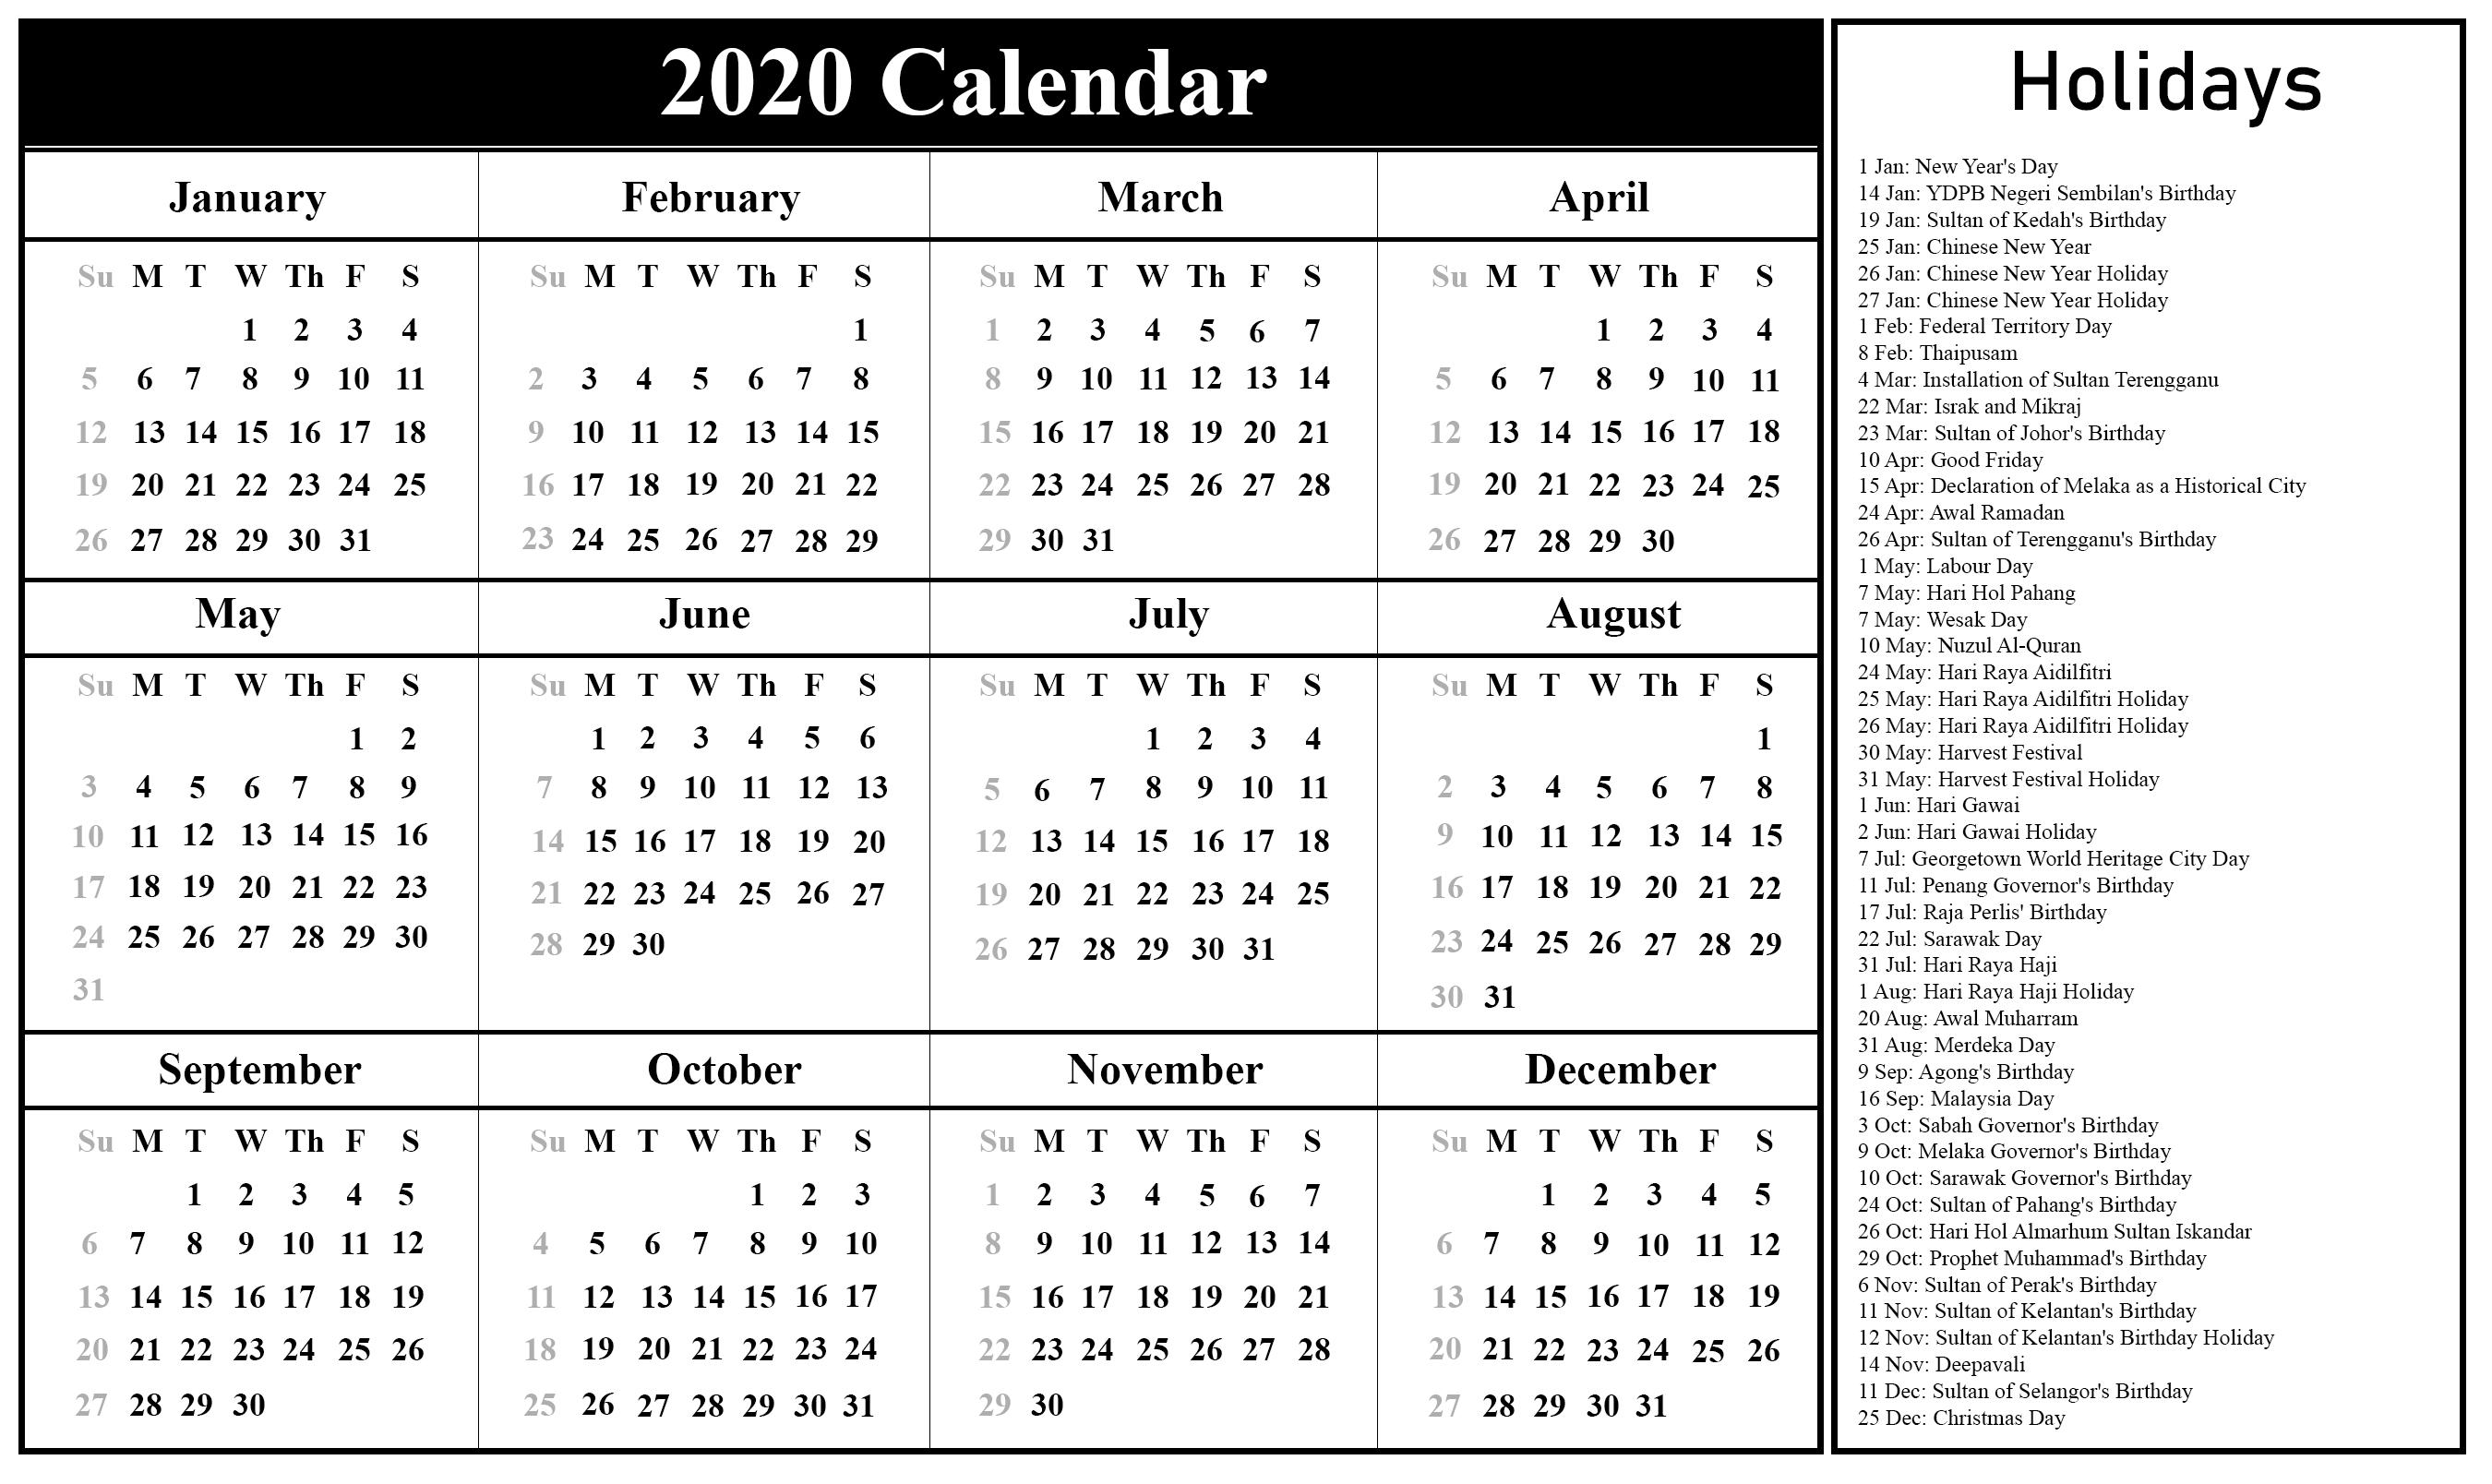 2020 Federal Leave Calendar